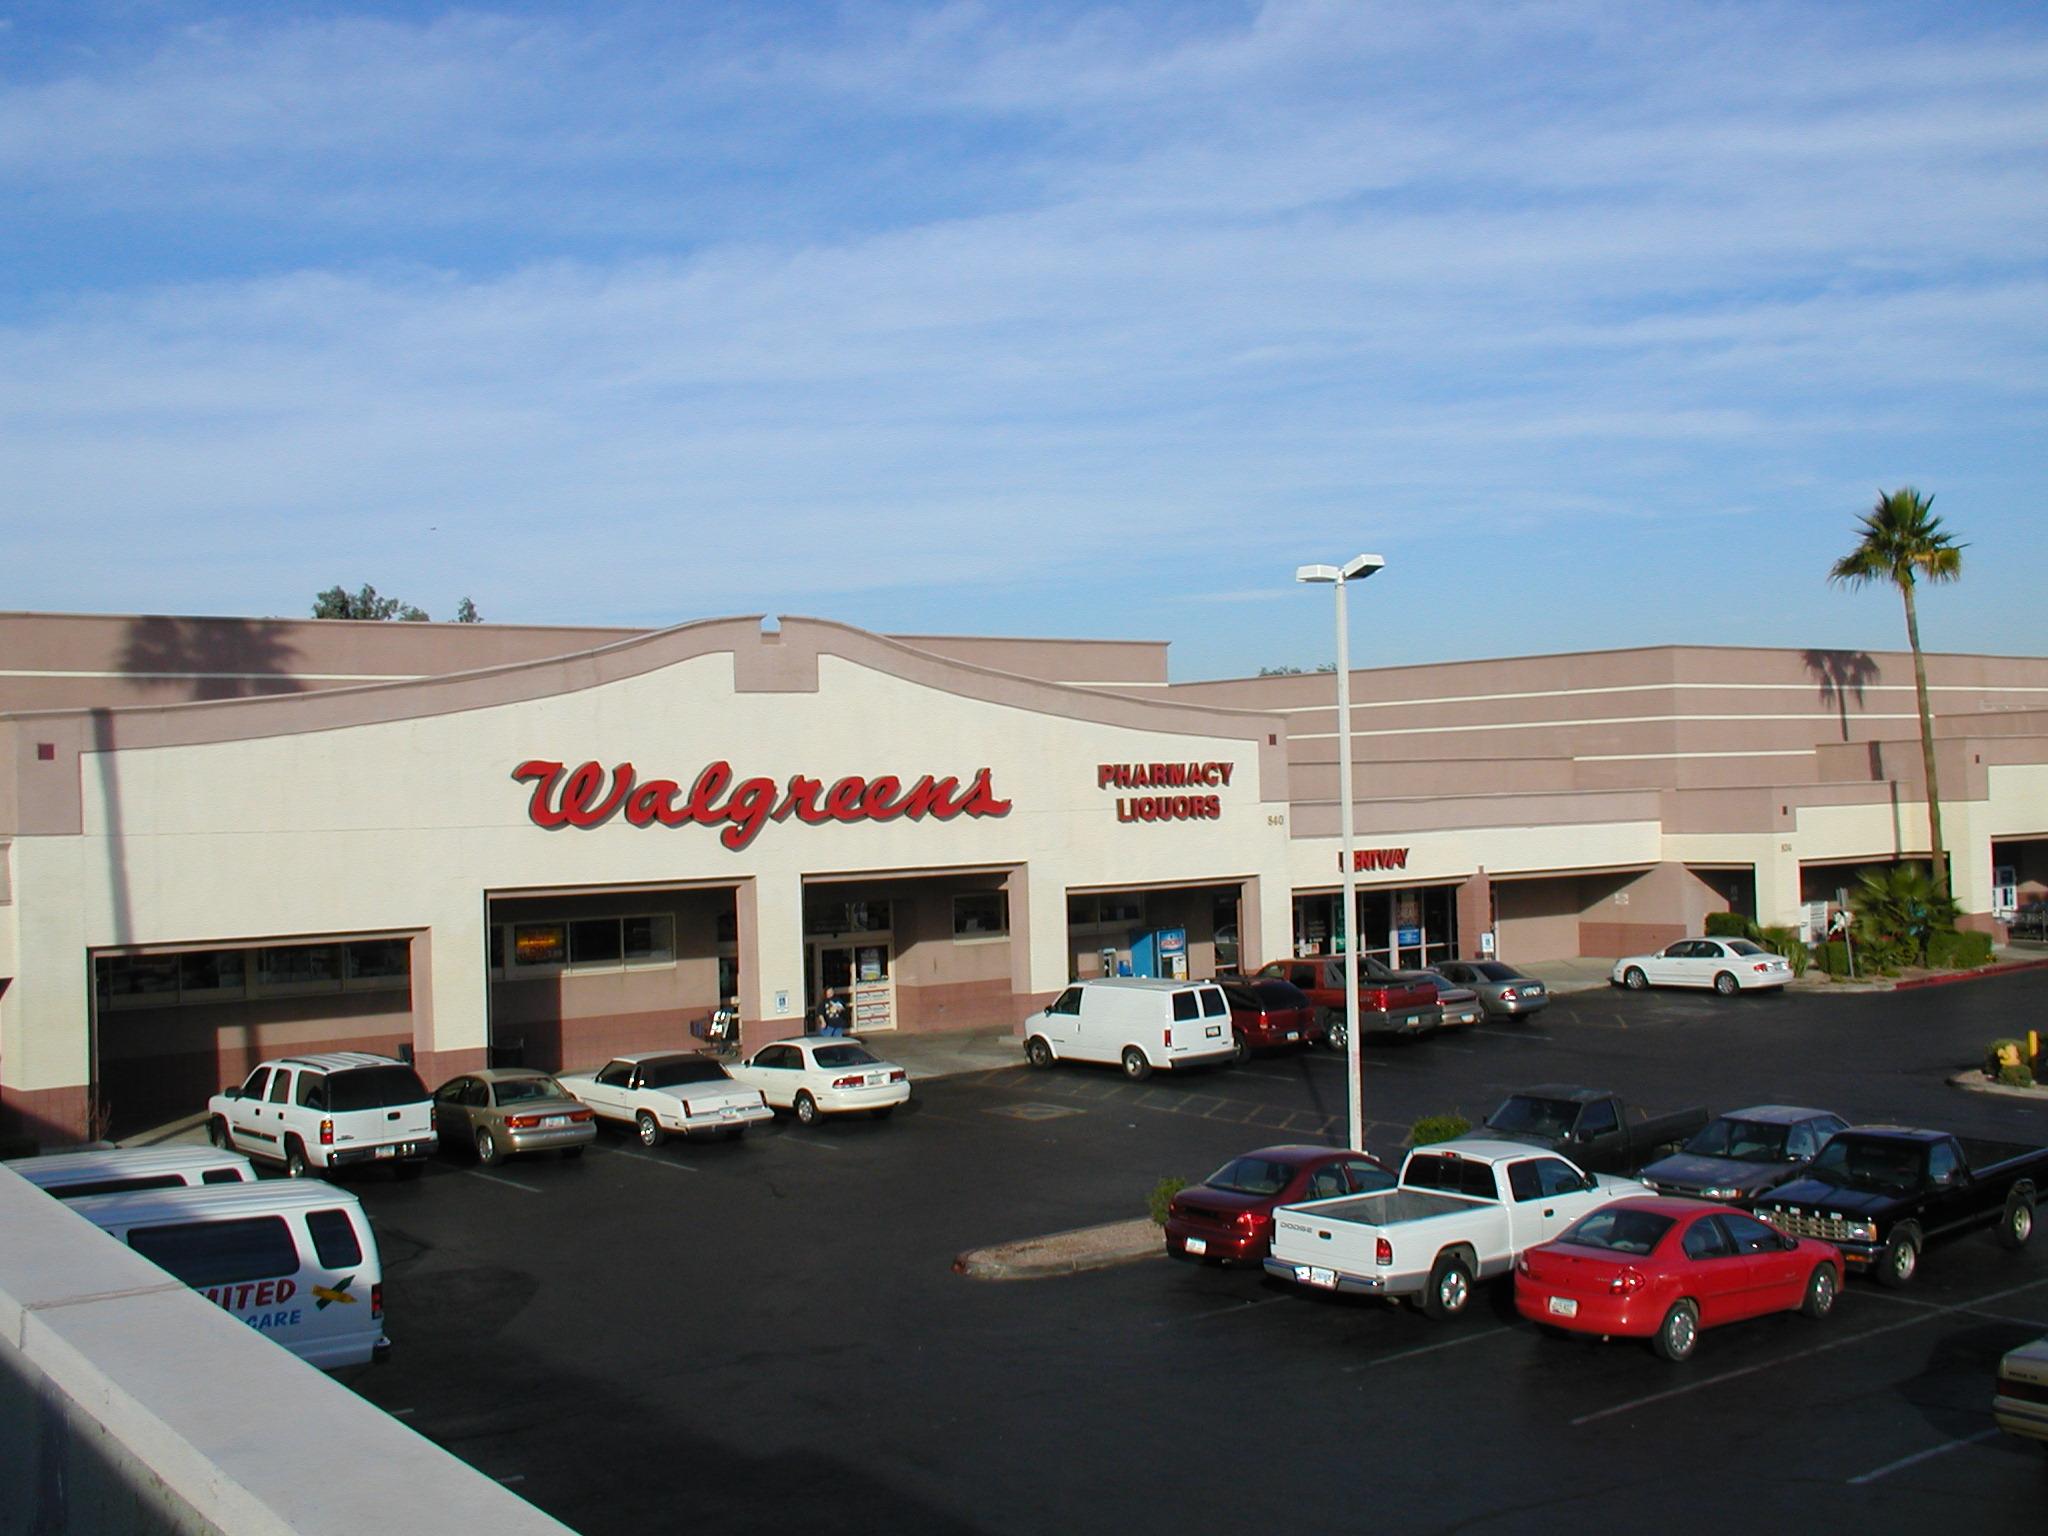 1012-11-03-wallgreens2.JPG